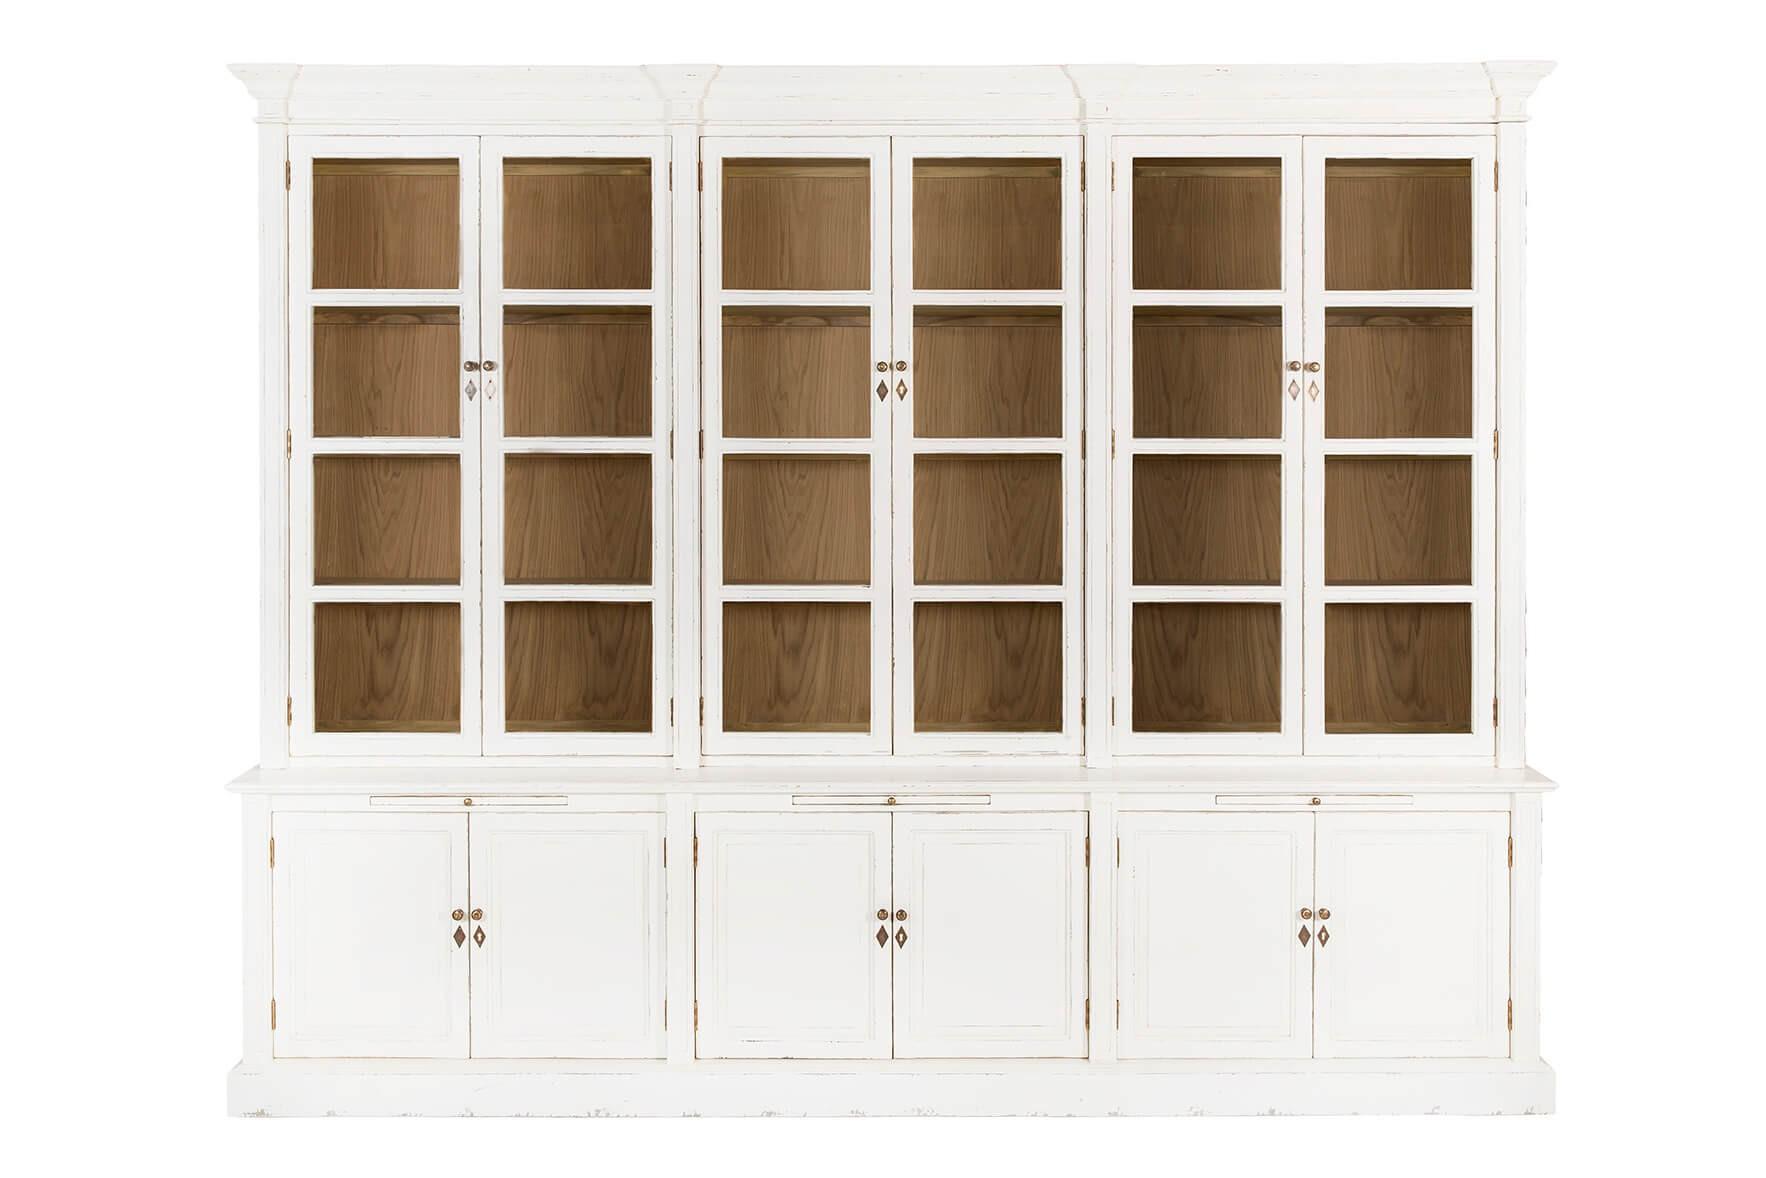 Oscar 2 part cabinet - 304*55*238cms